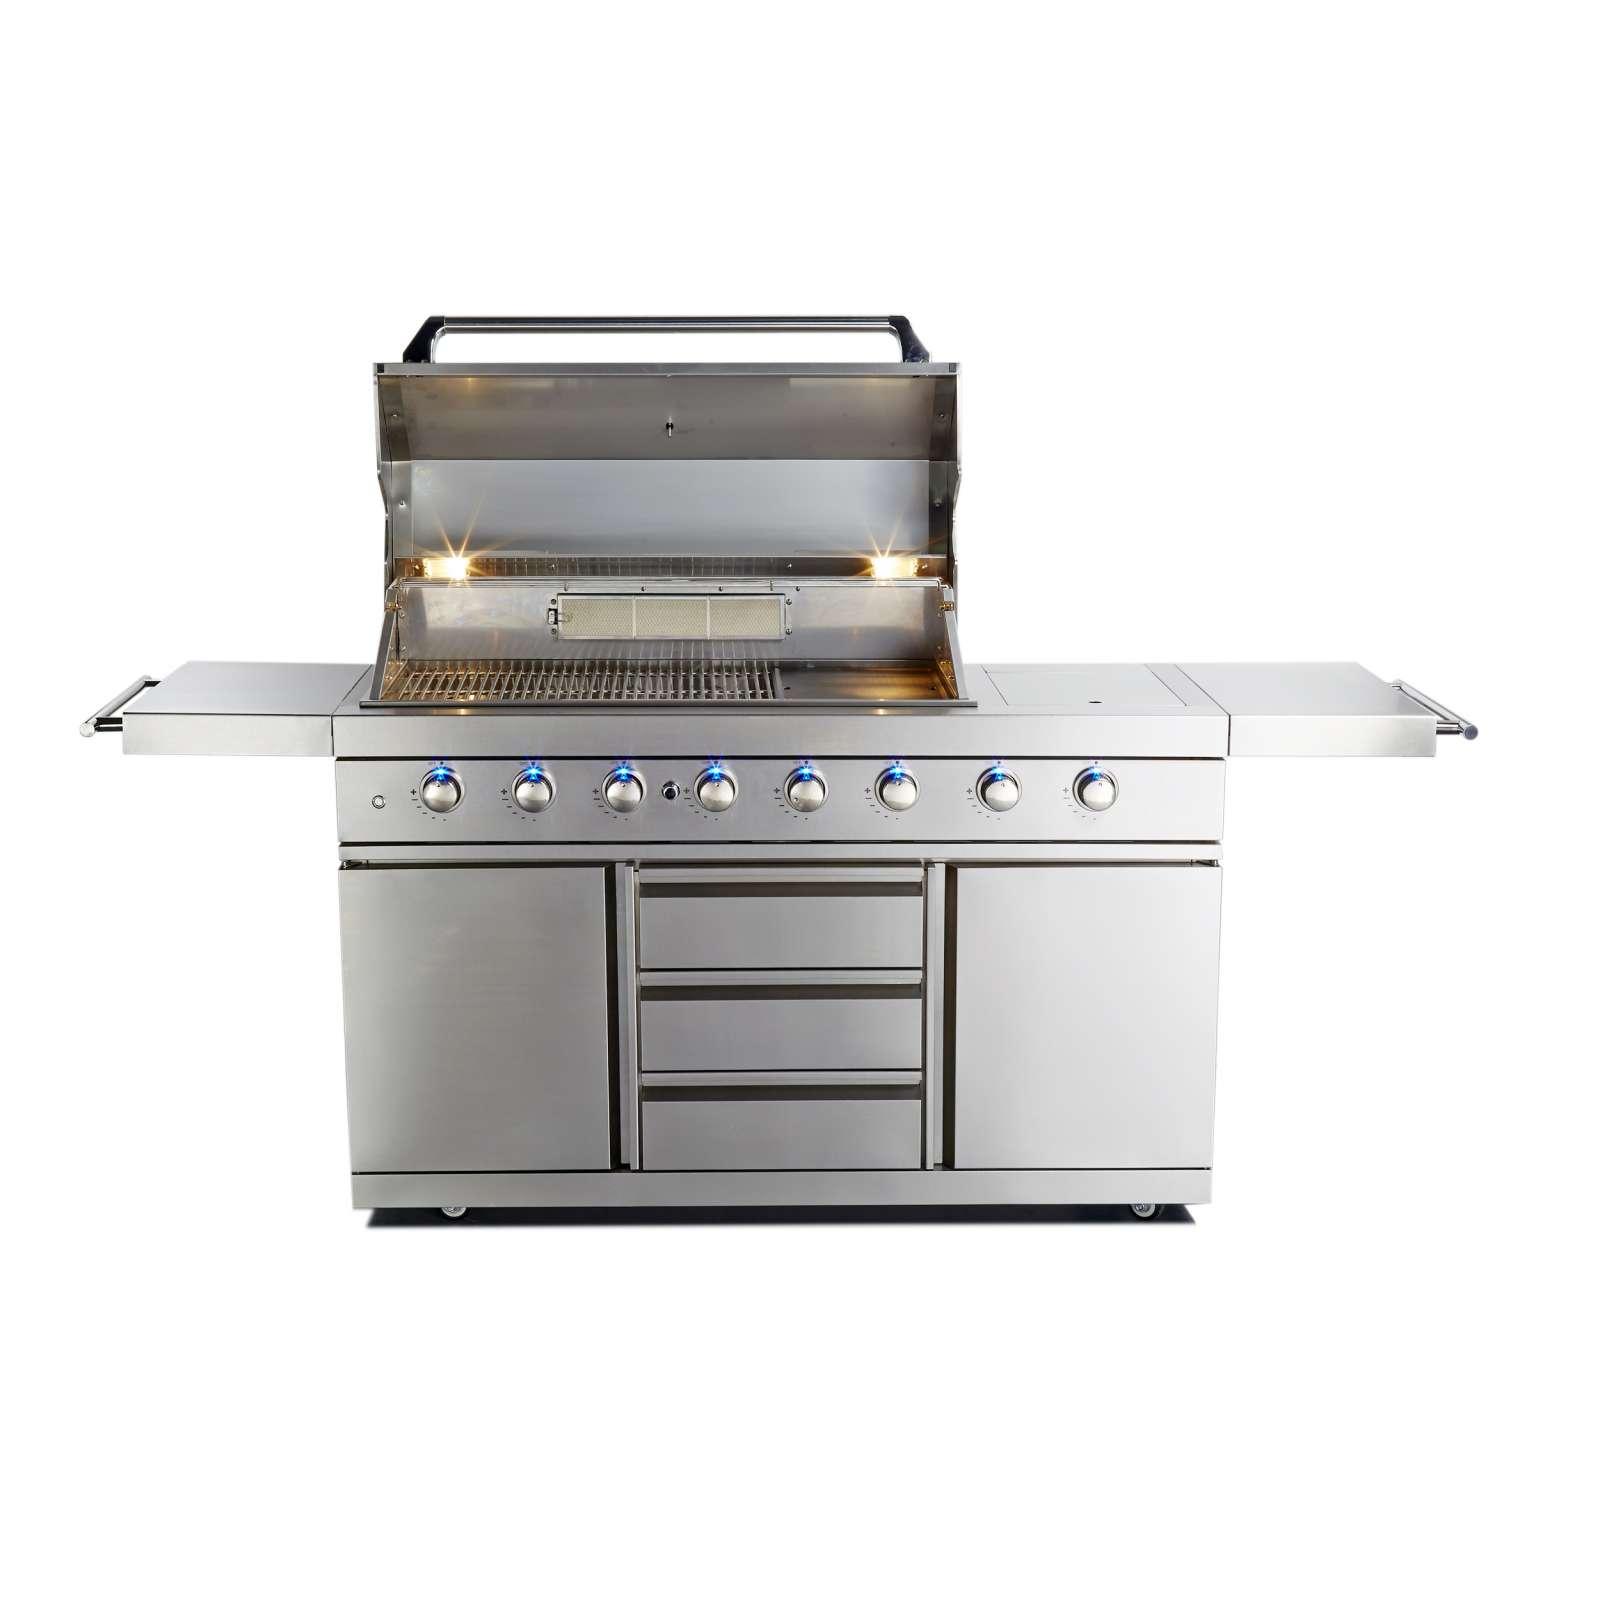 Allgrill Top-Line Ultra DeLuxe 304 Gasgrill Edelstahl Outdoor Küche